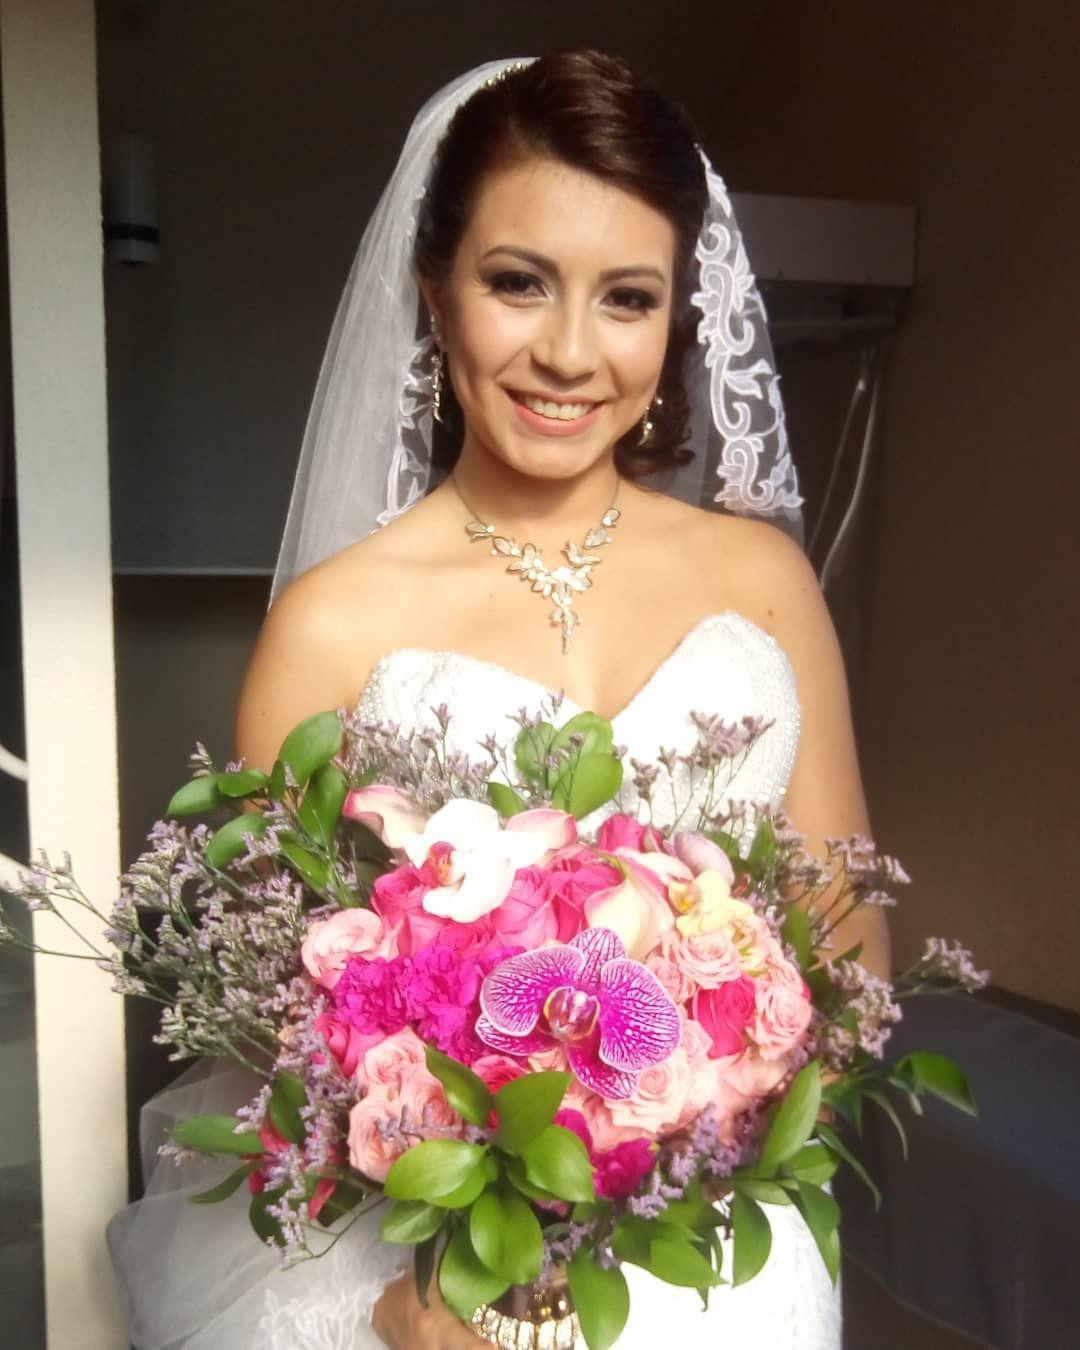 Noiva / Março - 2018 #noiva #wedding #cwb #makeupartist #casamento #beauty #bride #love #curitiba maquiagem maquiador(a)